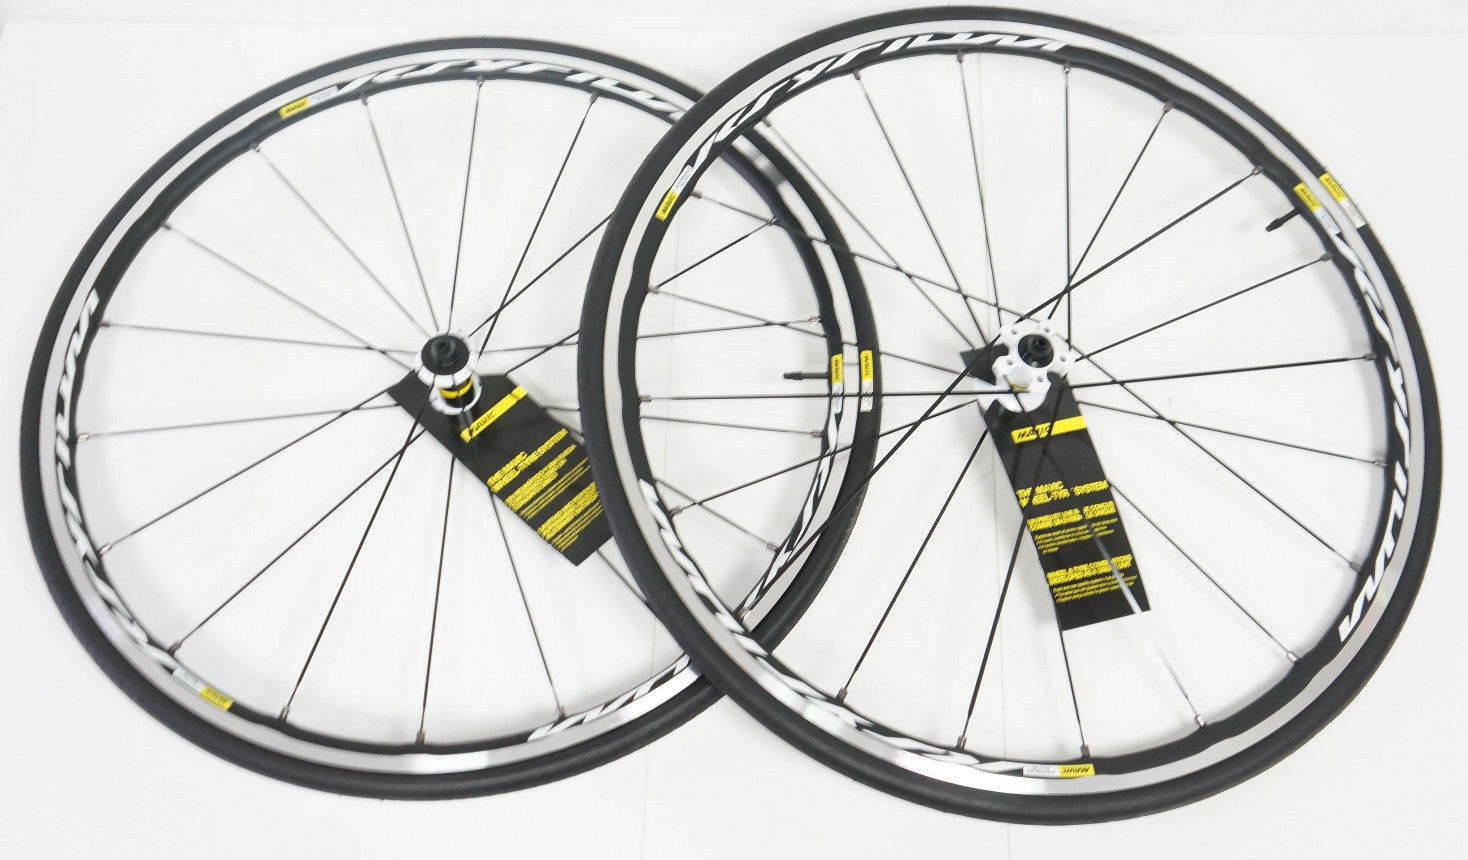 Mavic ksyrium elite wts 28  ruedas negro-blancoo nuevo  249